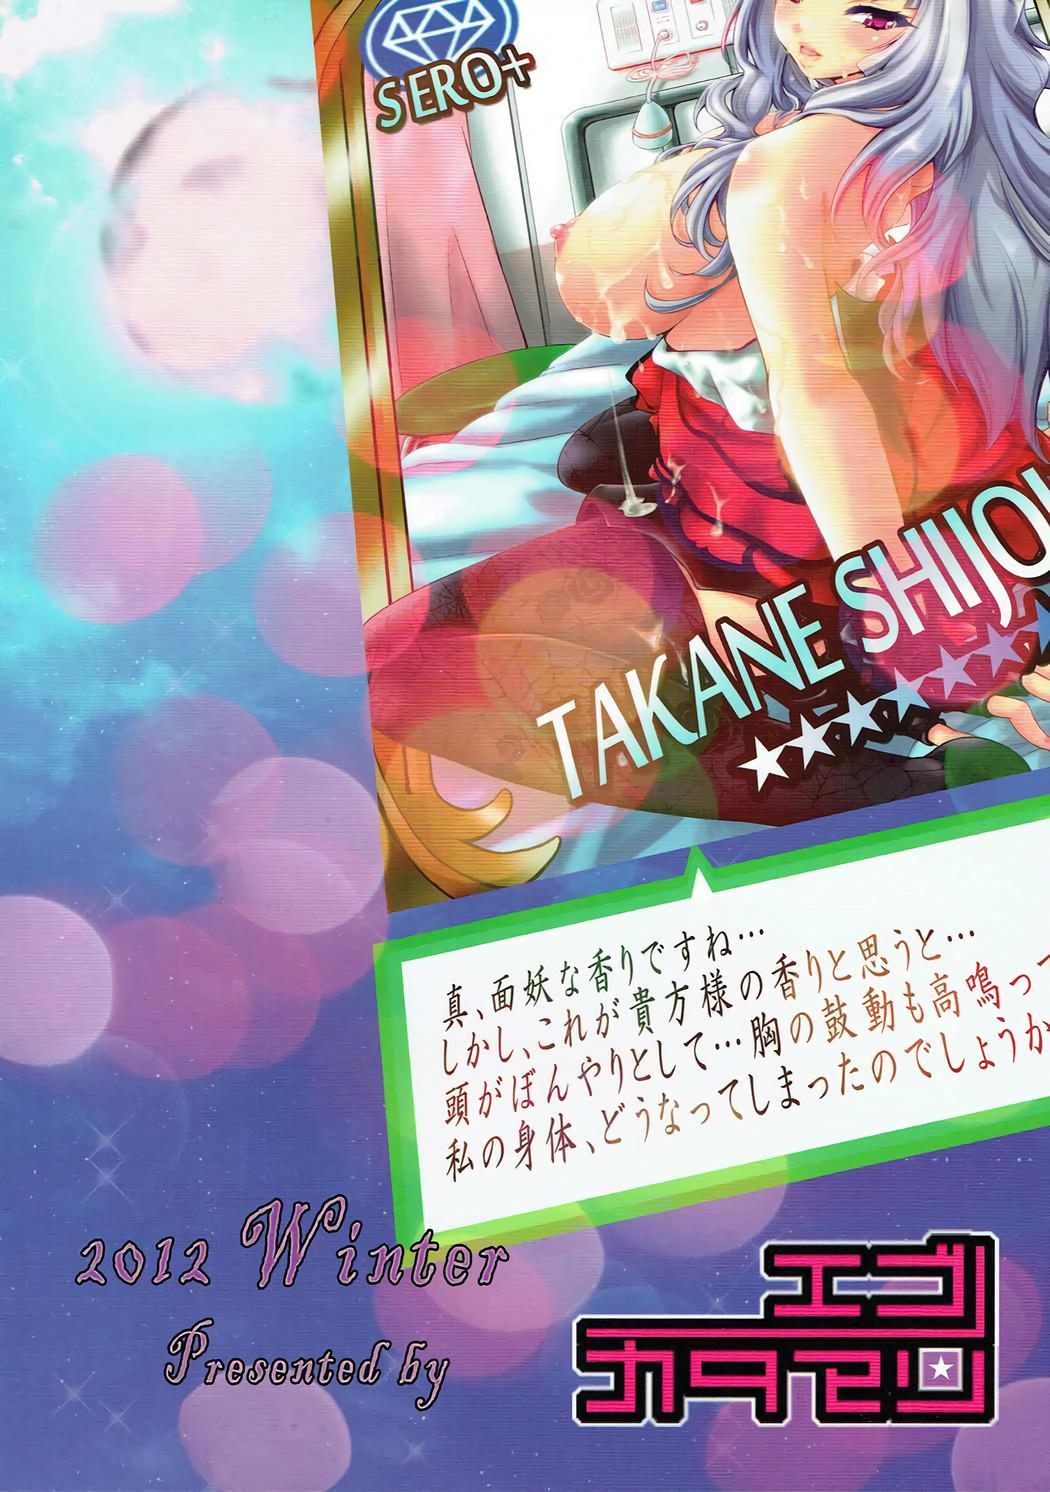 Takane Shuran 33